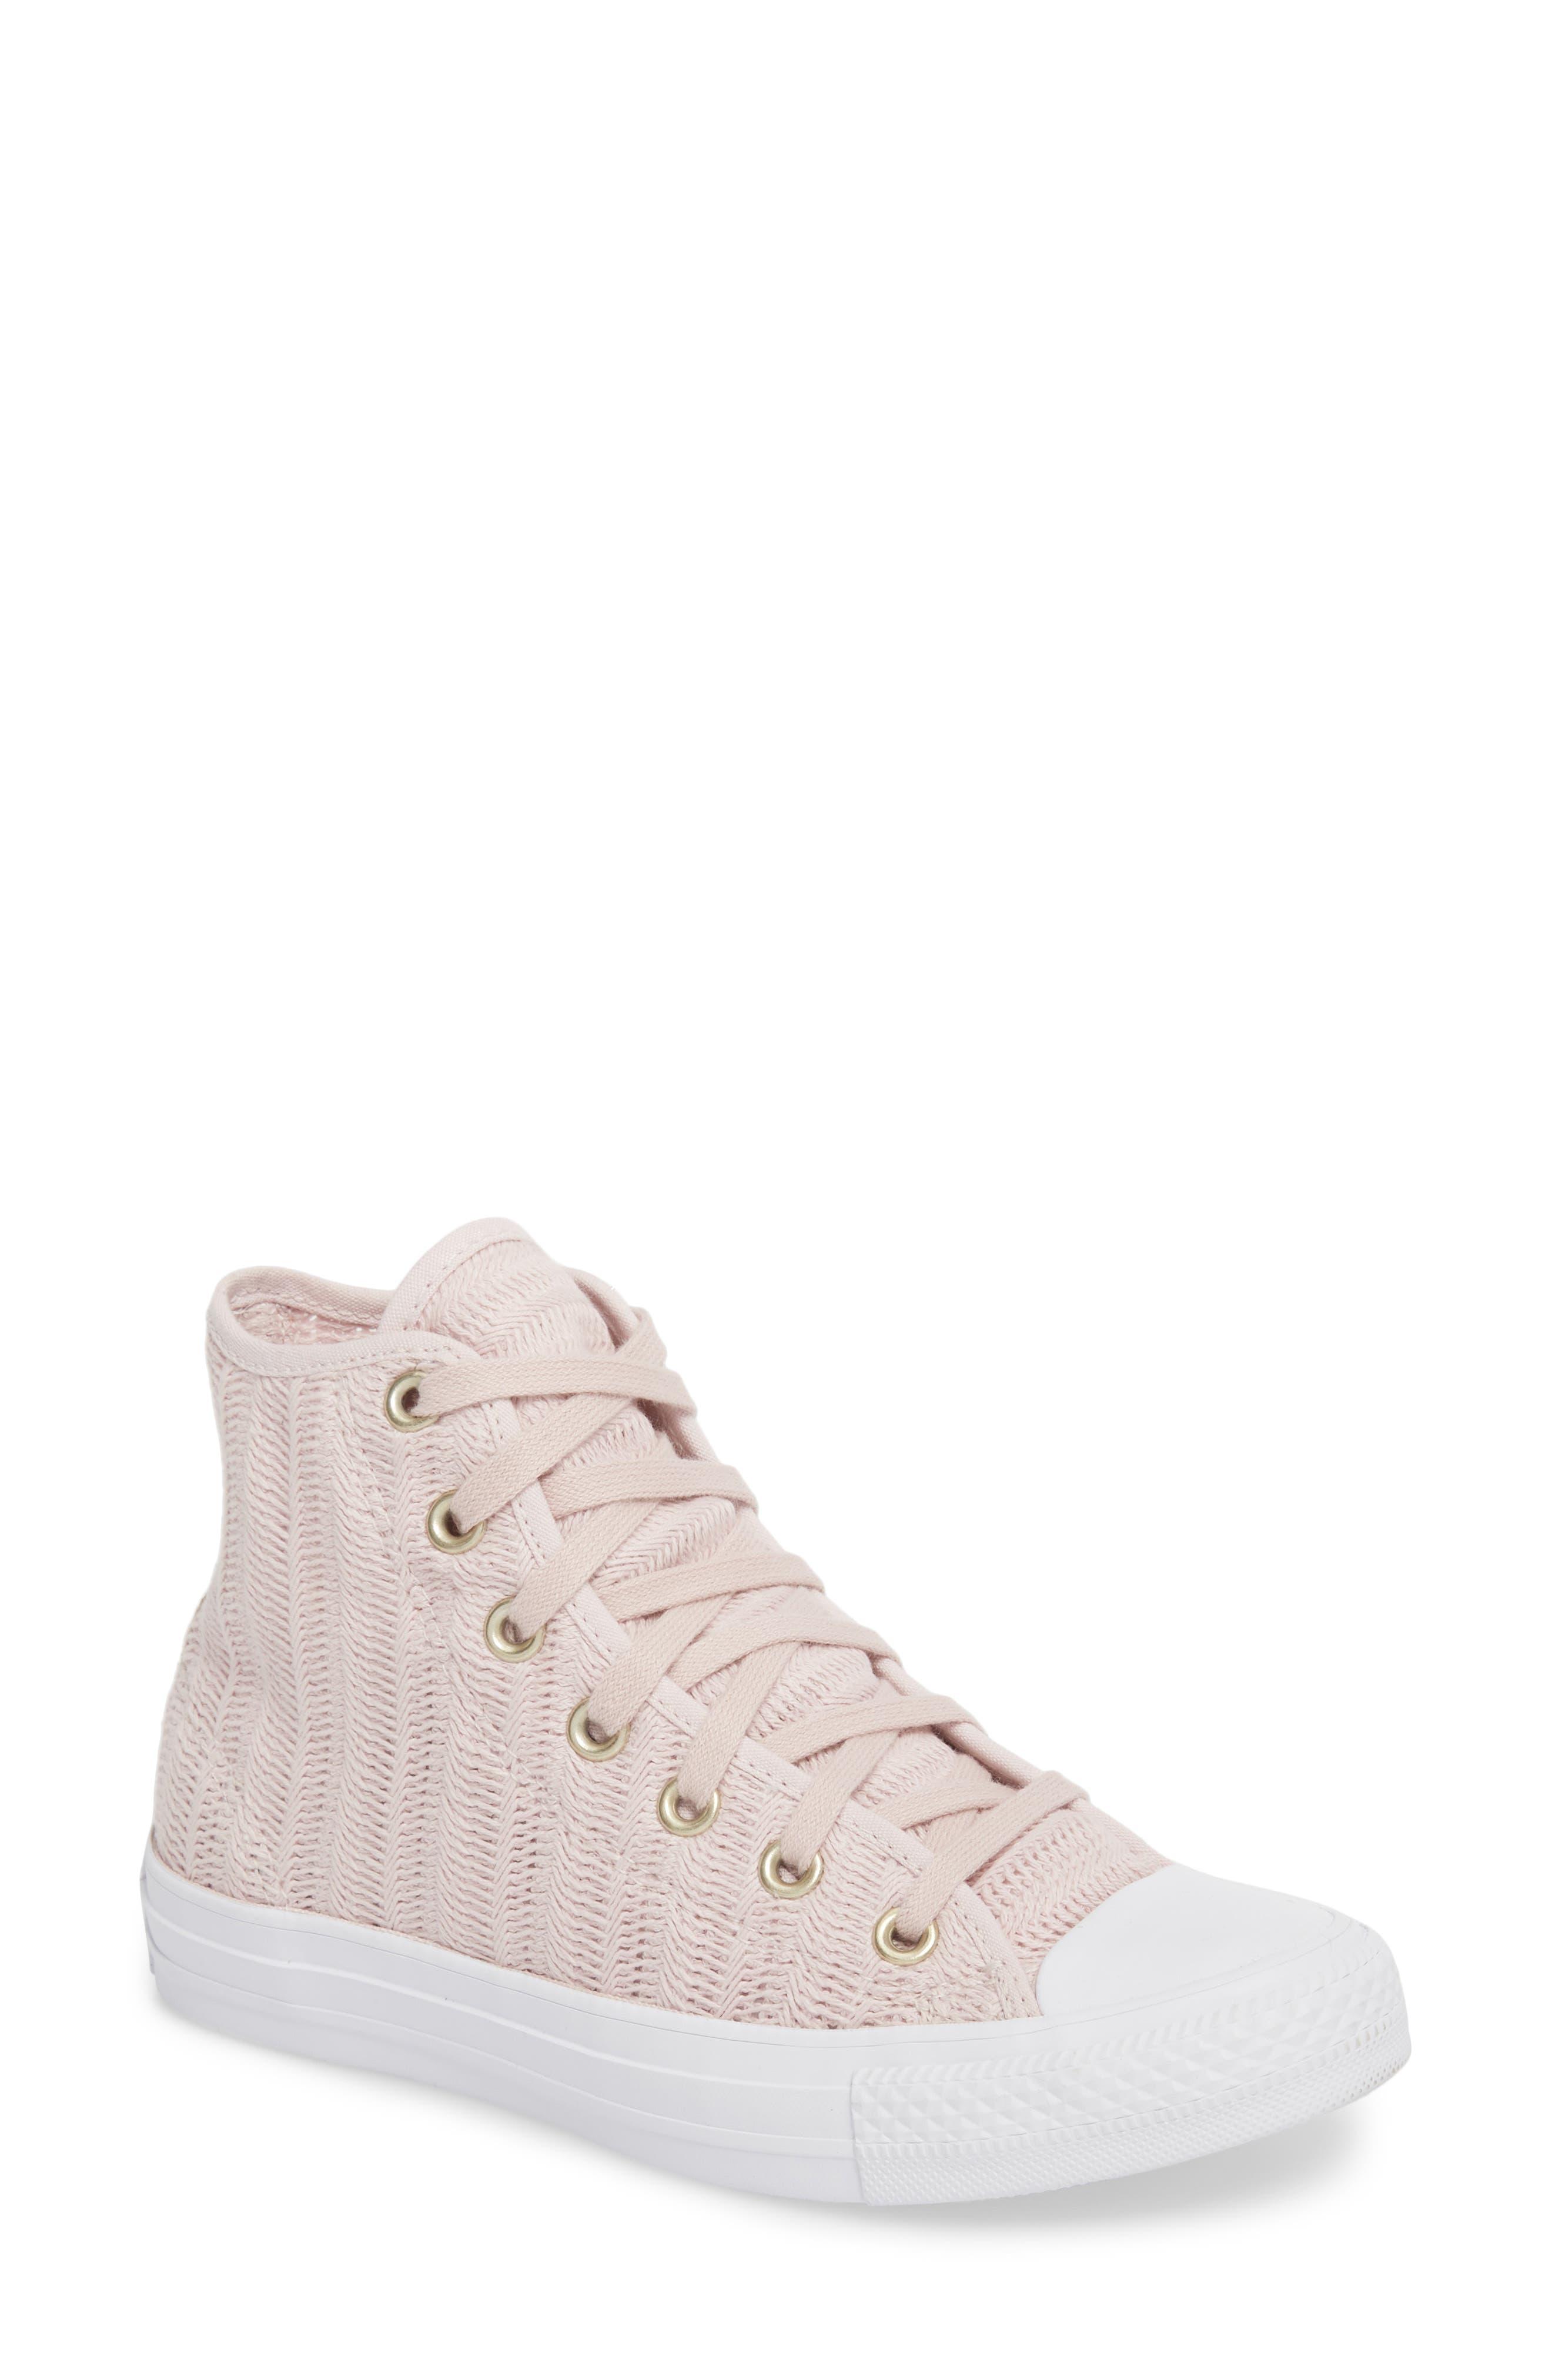 Chuck Taylor<sup>®</sup> All Star<sup>®</sup> Seasonal Hi Sneaker,                         Main,                         color, Barely Rose